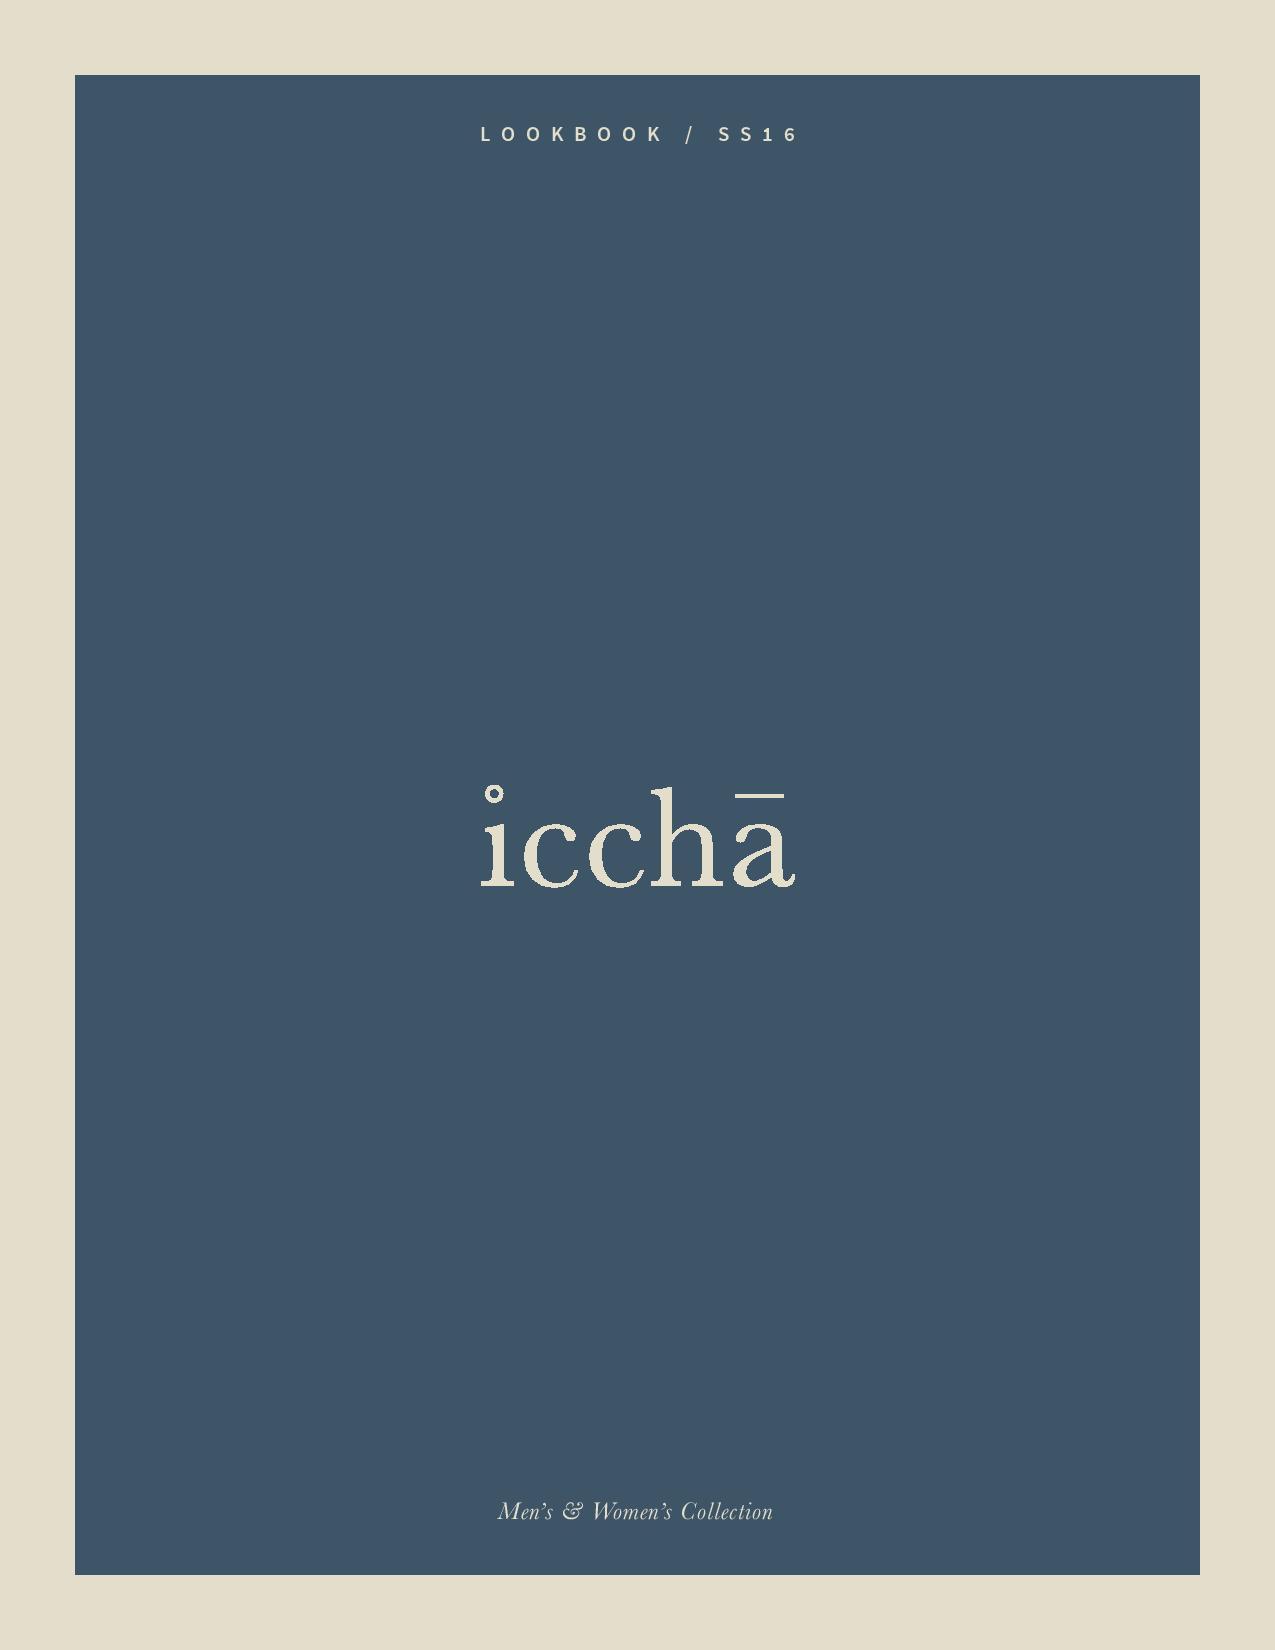 Iccha_LookBook_SellSheet_v4_Both_W+M_HR-page-001.jpg